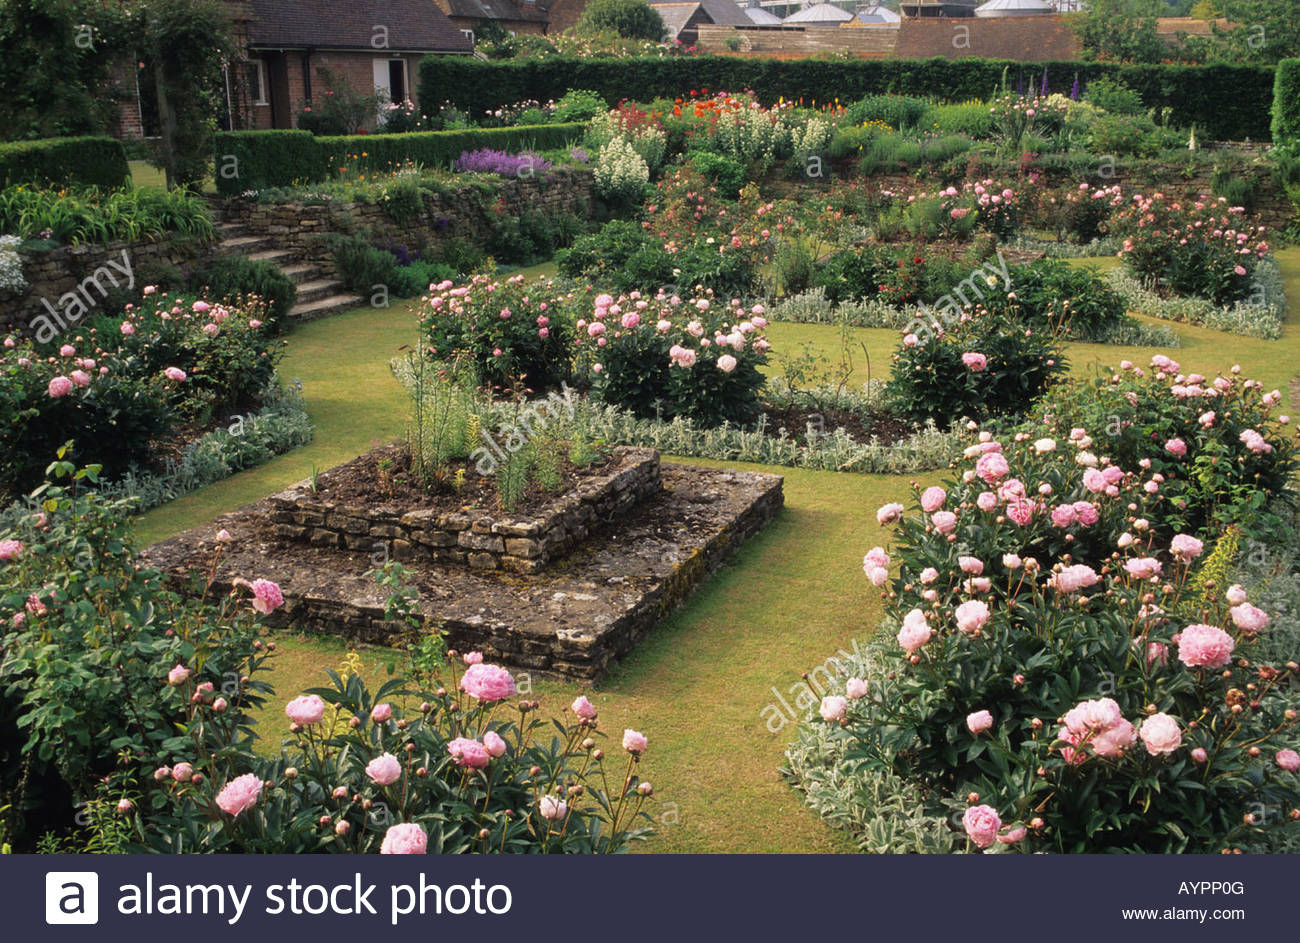 The Manor House Upton Grey Hampshire sunken garden Gertrude Jekyll on